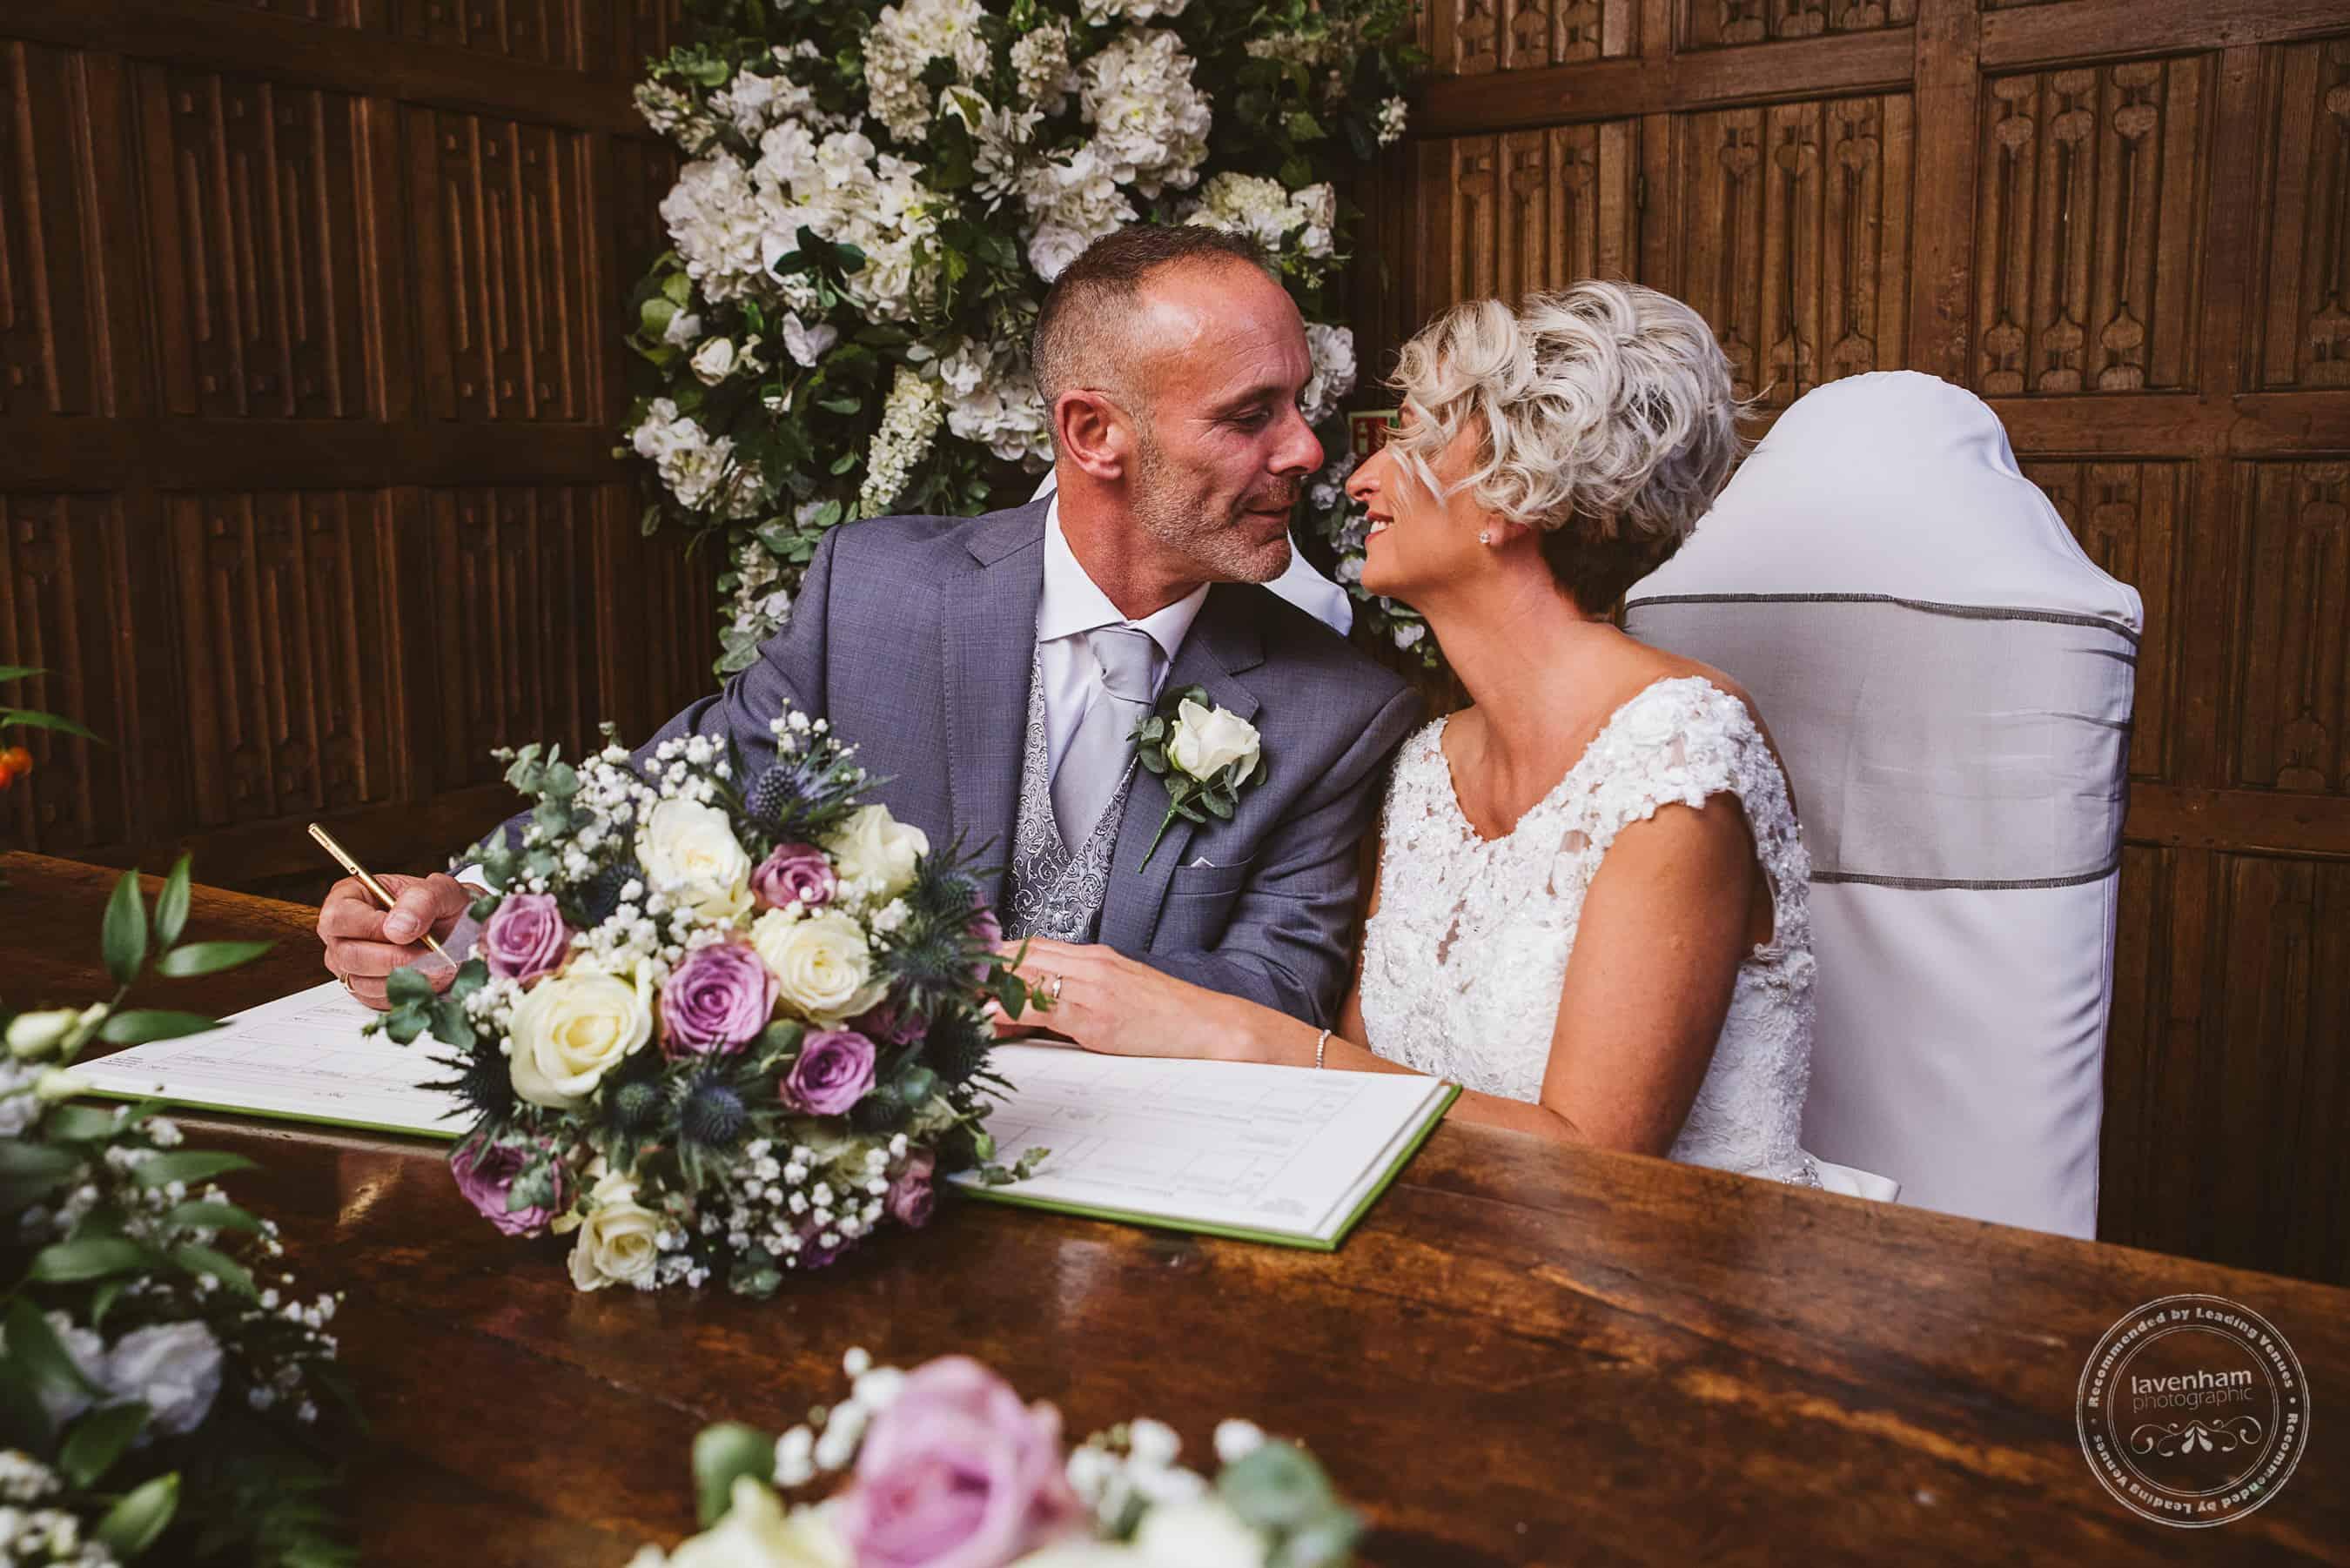 281018 Gosfield Hall Wedding Photography Lavenham Photographic 054